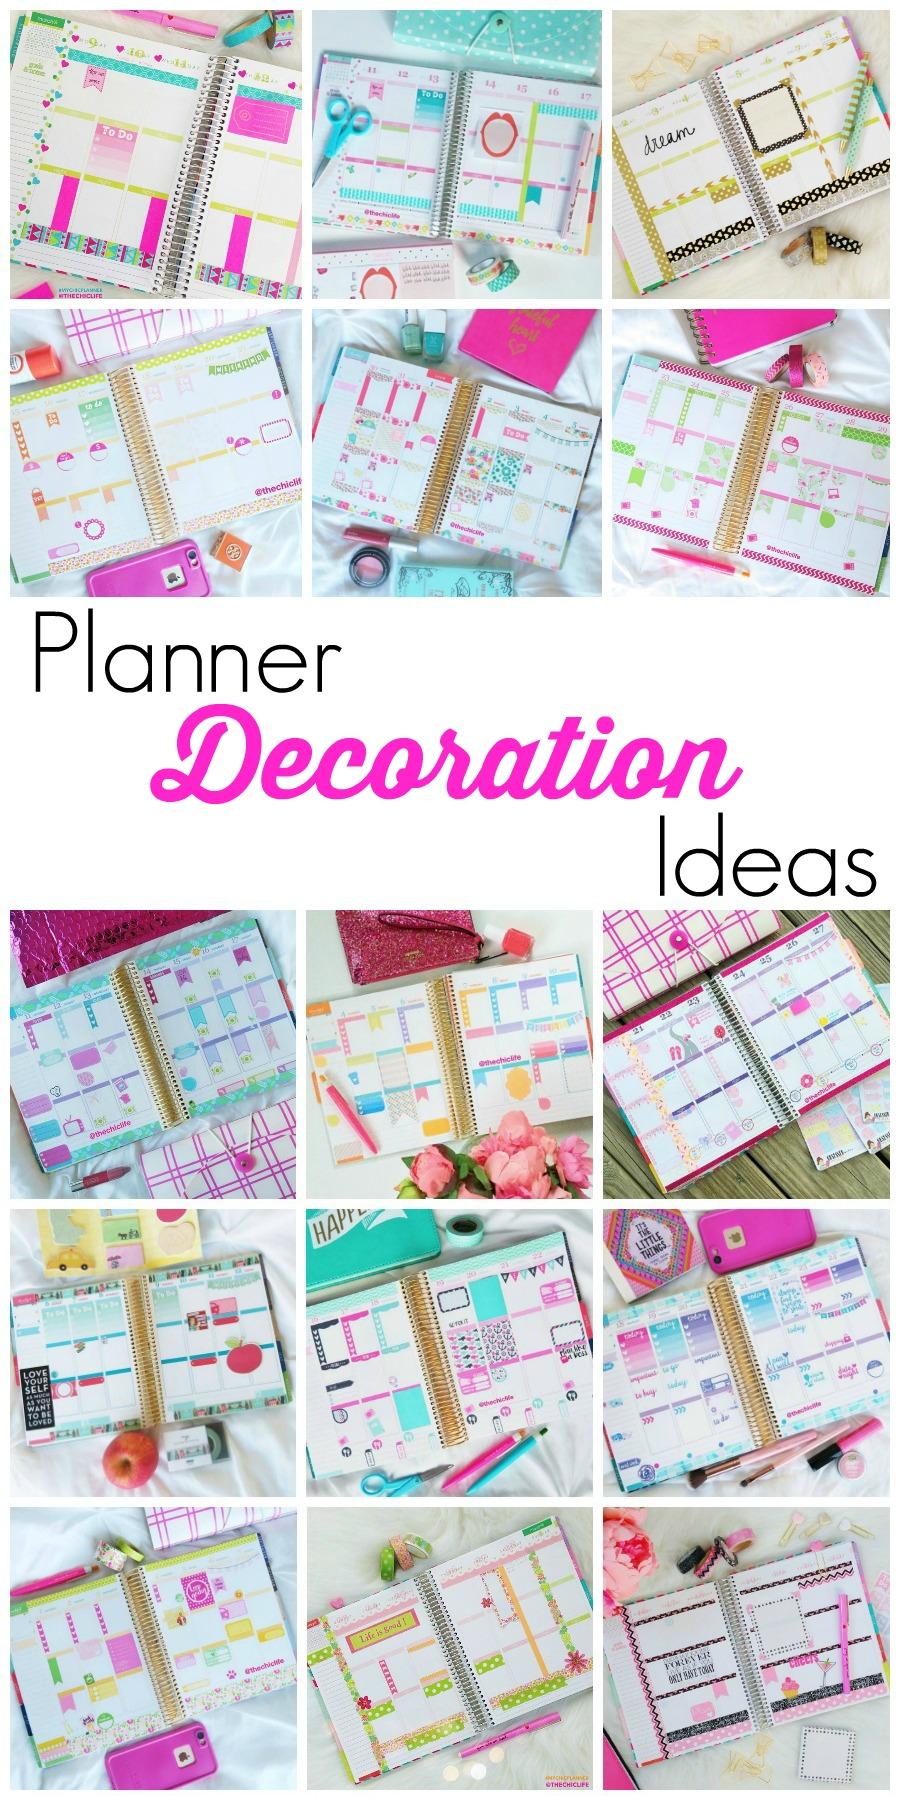 plannerdecorations